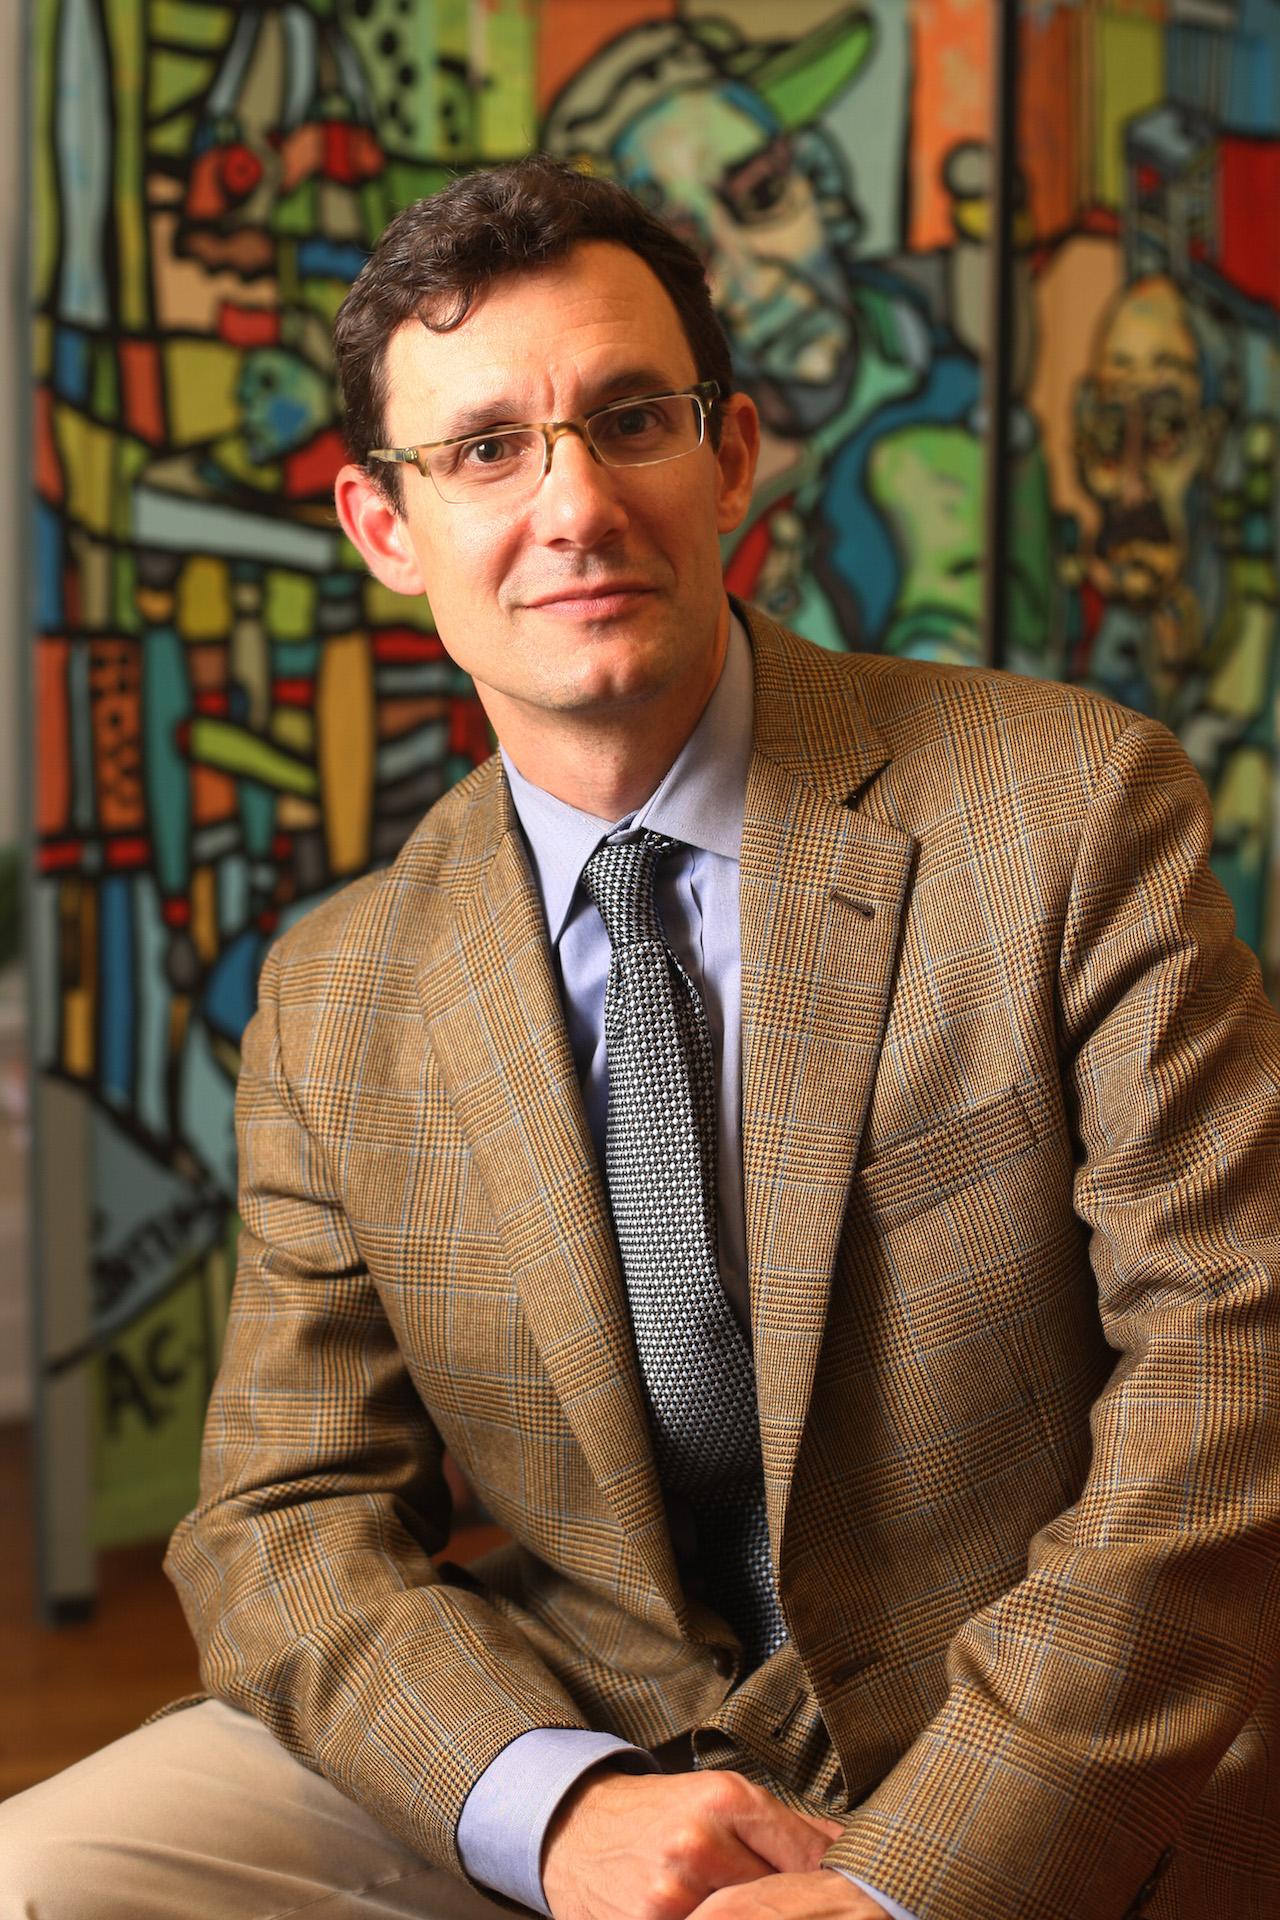 11-10-10 - Photos of Assistant Professor of Sociology Steven J. Tepper of the Curb Center at Vanderbilt located at 1801 Edgehill Ave. (Vanderbilt University / Steve Green)